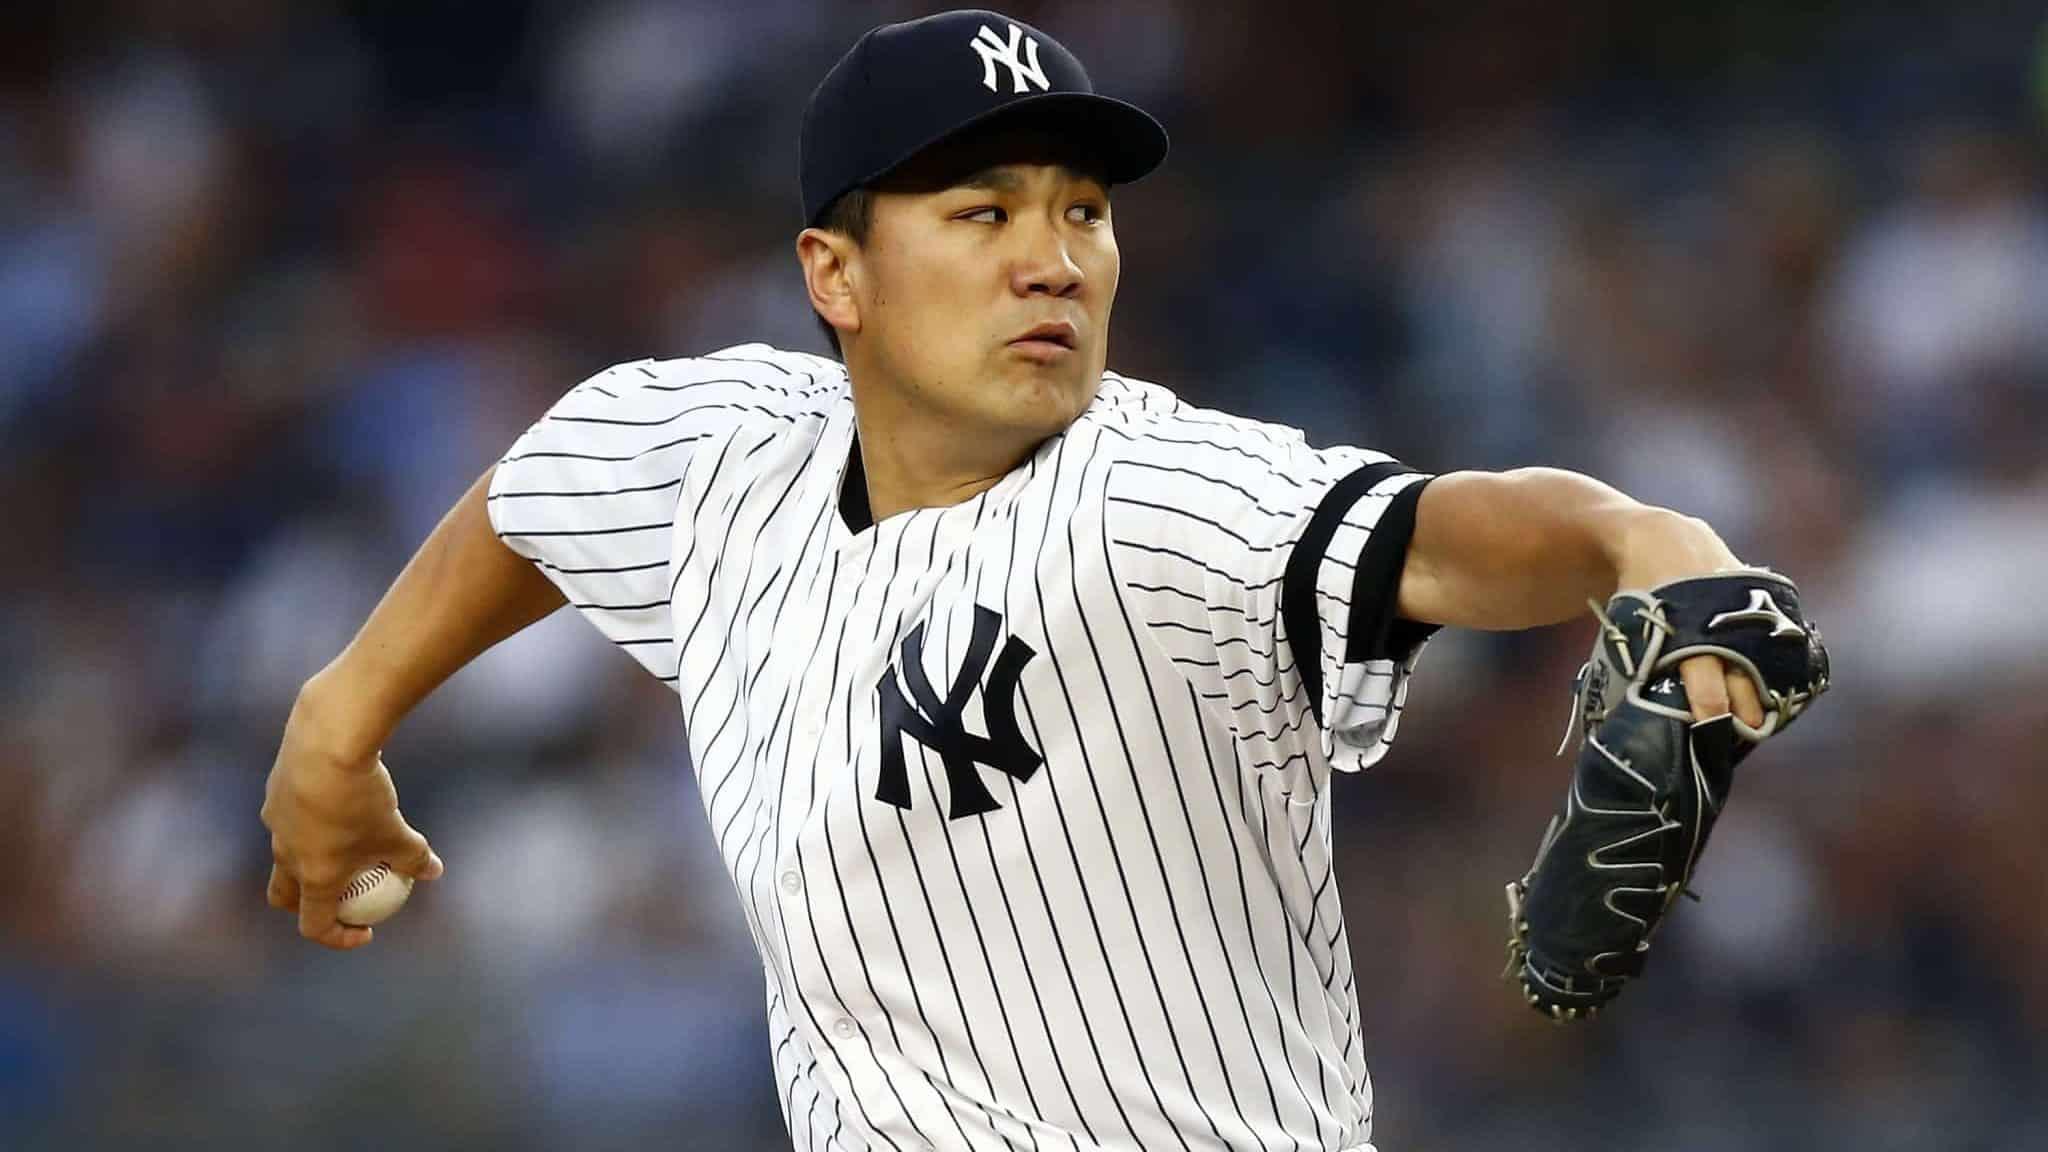 New York Yankees: Masahiro Tanaka deserves an extension